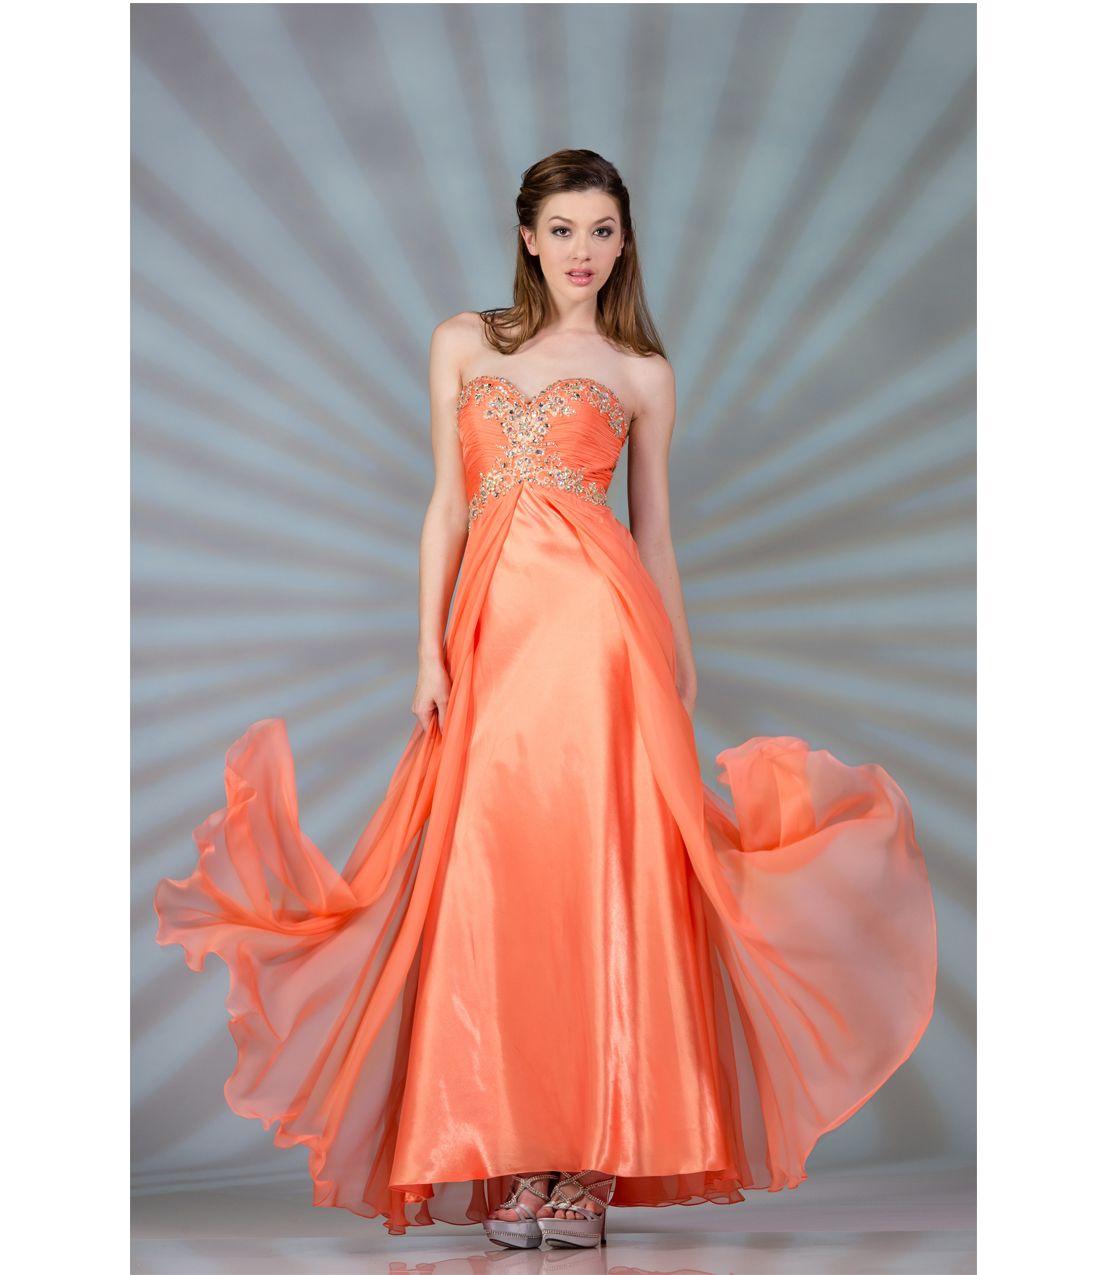 Bridesmaid dresses salmon color 2013 prom dresses salmon vintage 1950s style black high halter neck bow one piece swimsuit orange prom dressesdresses ombrellifo Image collections